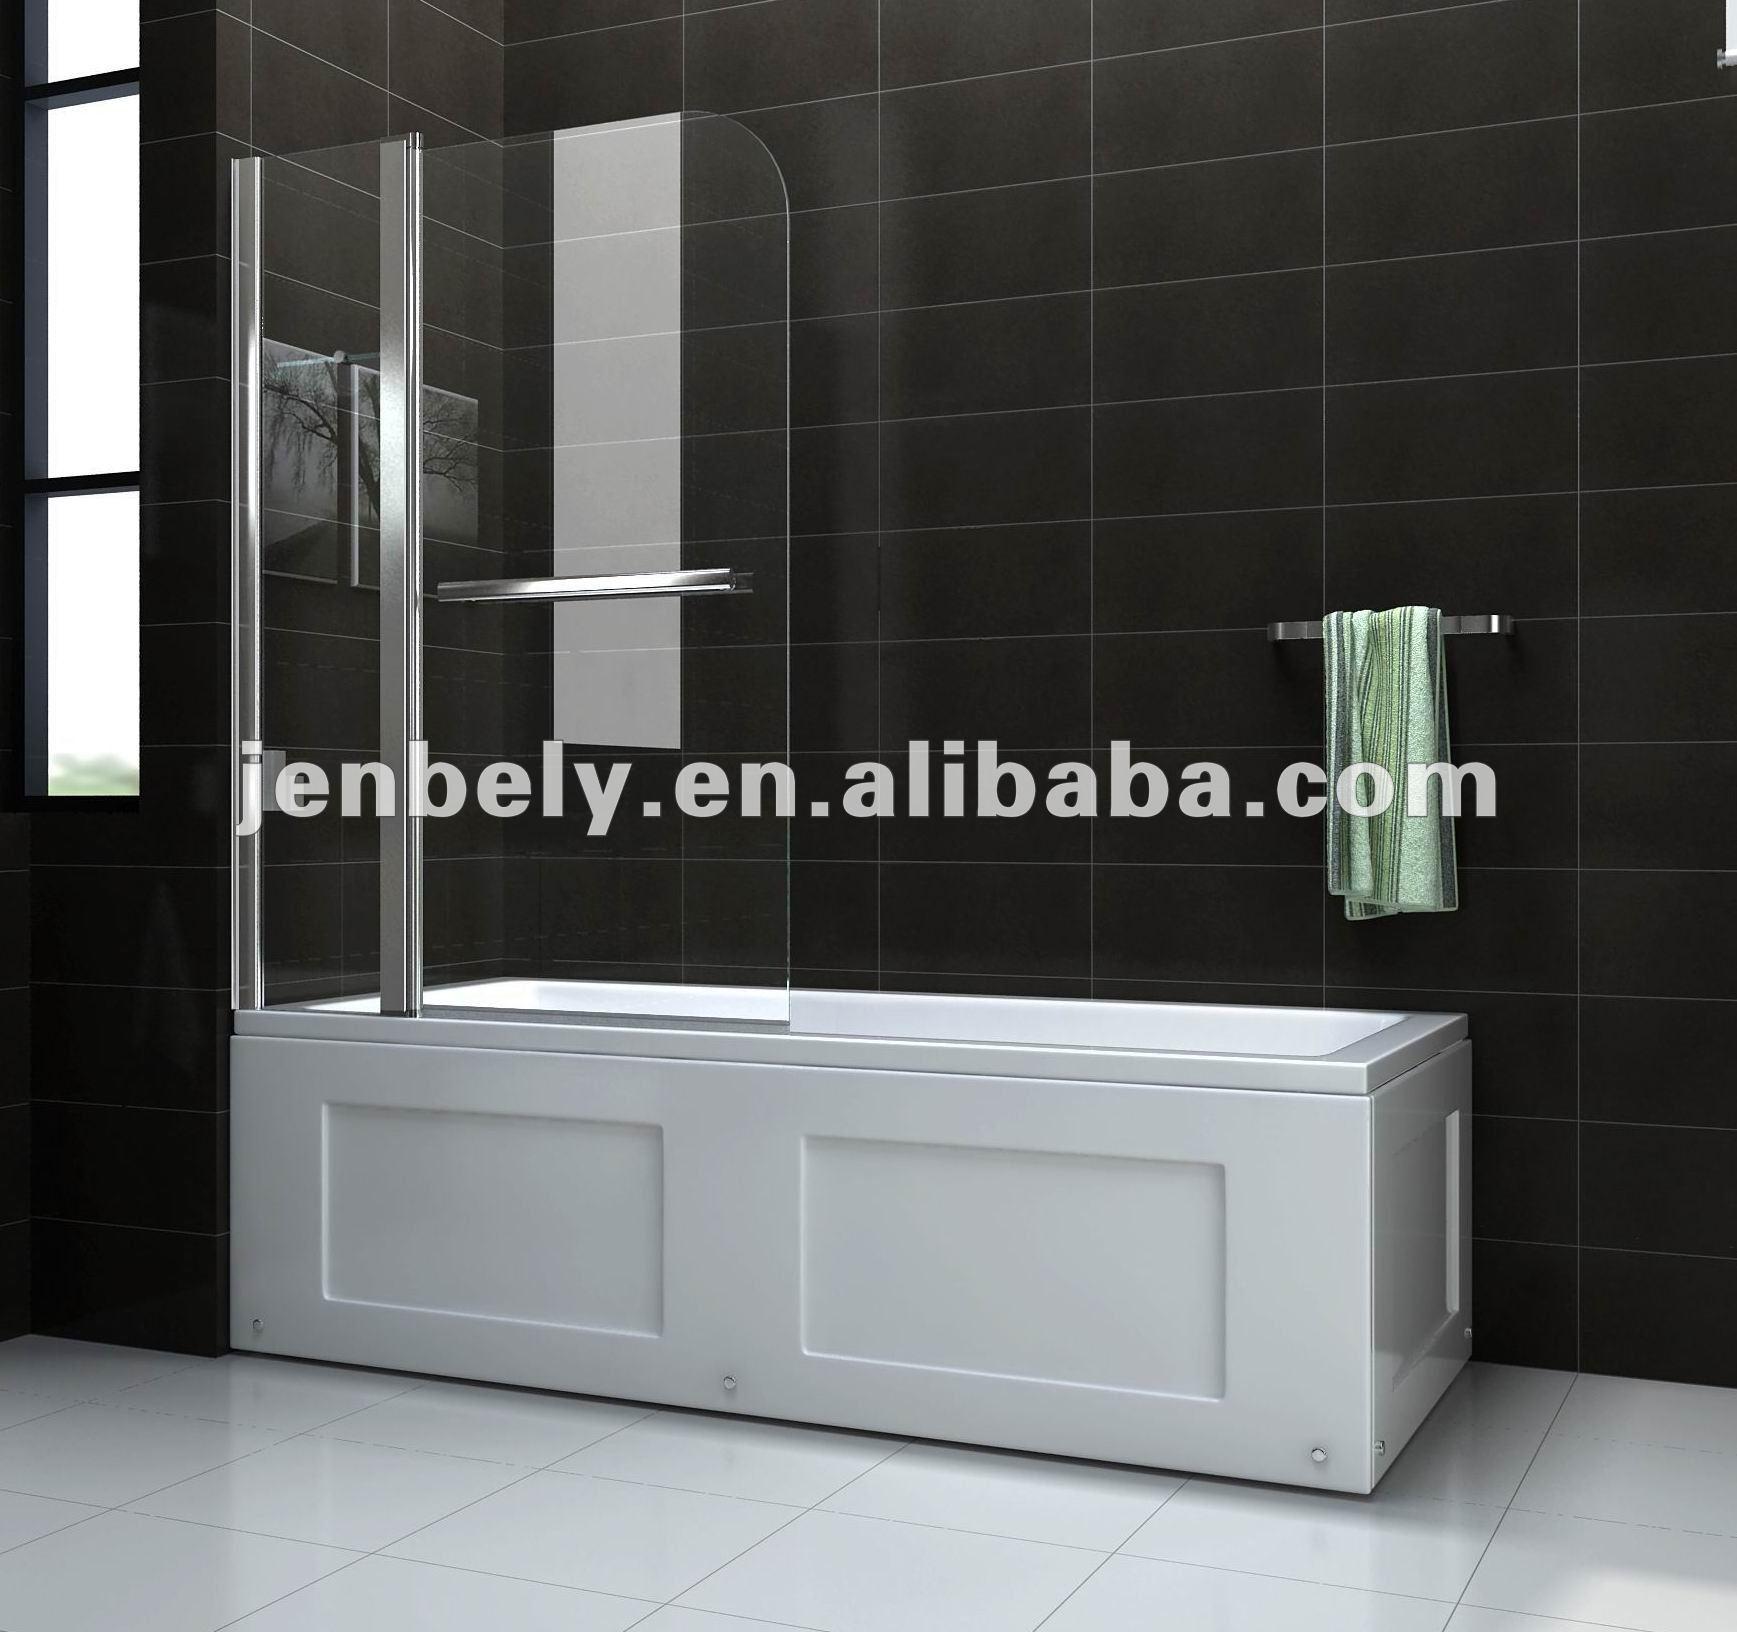 Vetro vasca da bagno vasca da bagno schermo bagno con - Vasca da bagno in vetro ...